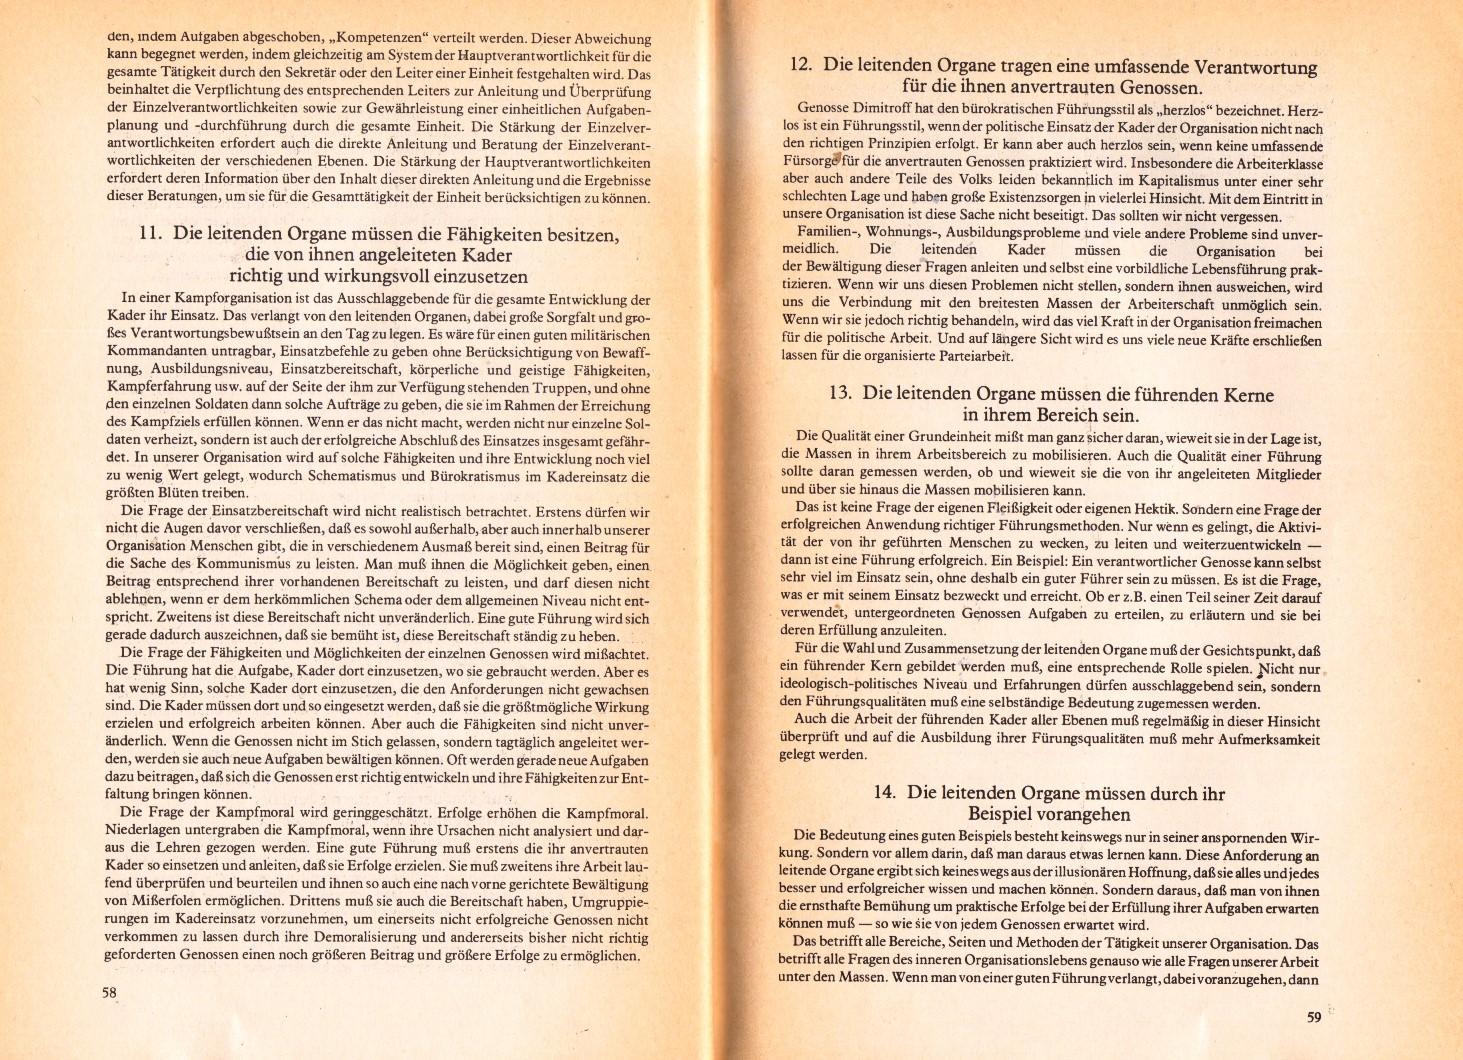 KBOe_1979_Doku_ZK_Plenum_04_31